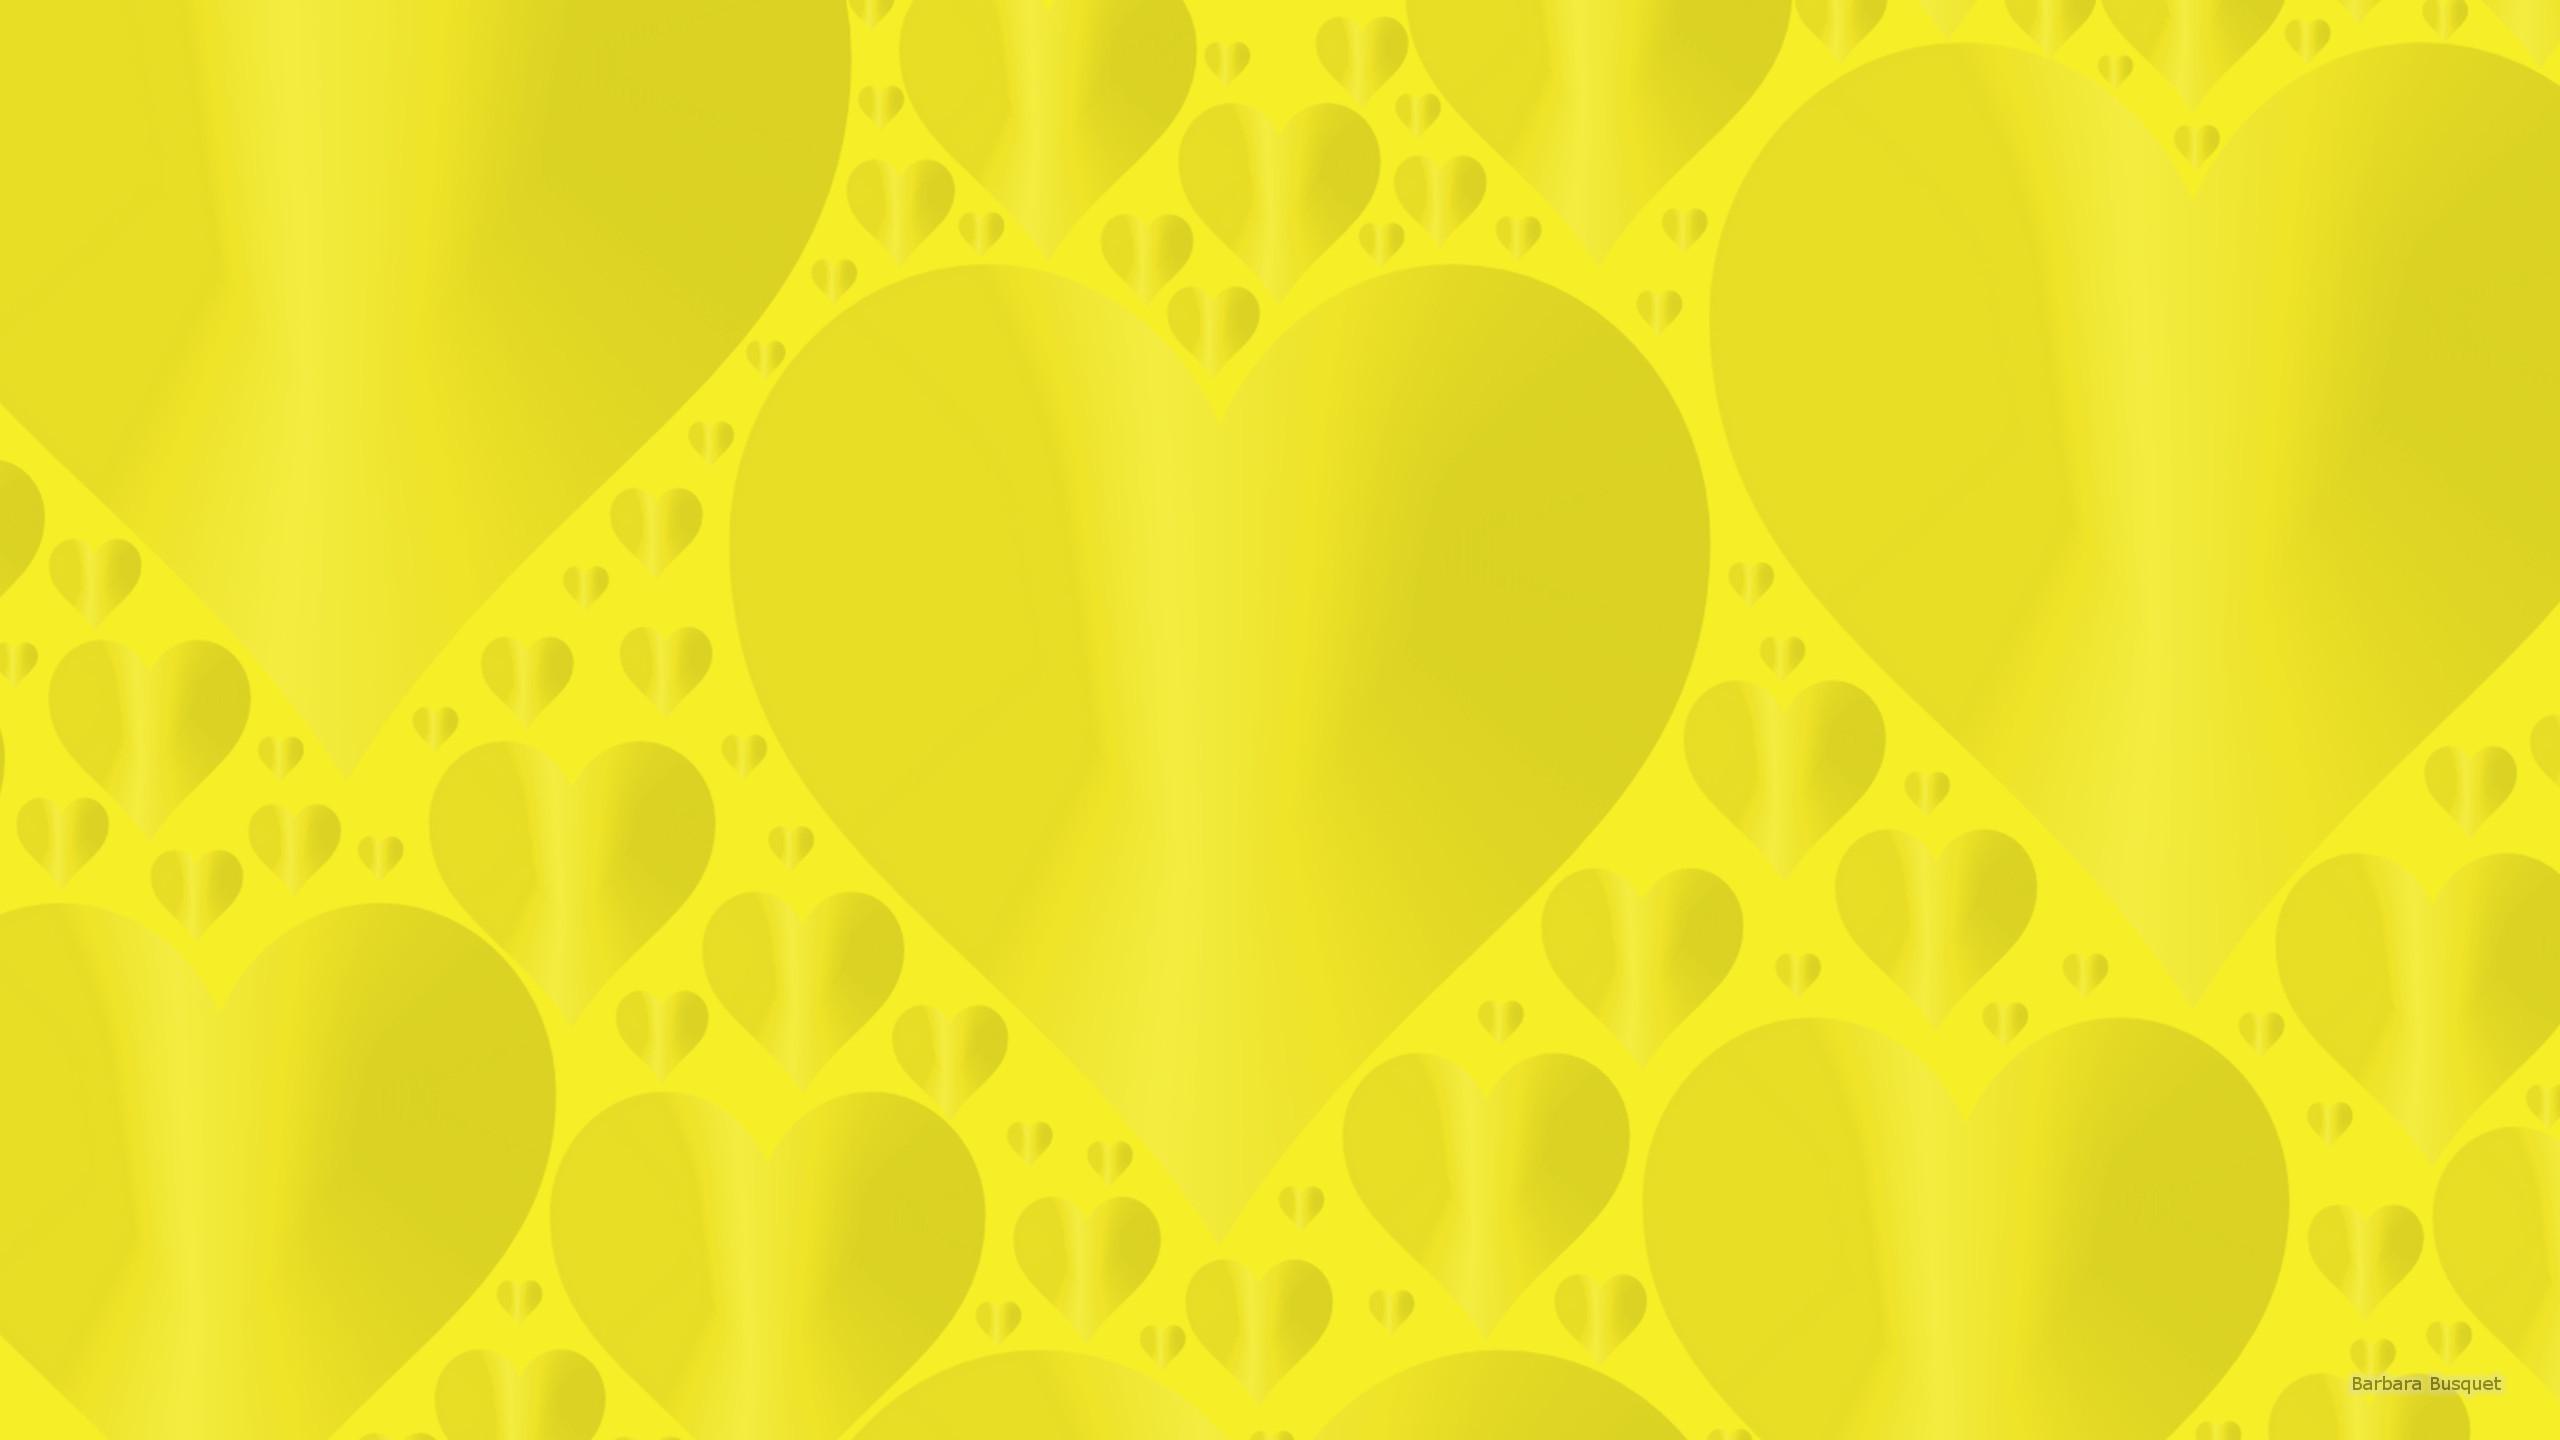 Dark yellow wallpaper with hearts.